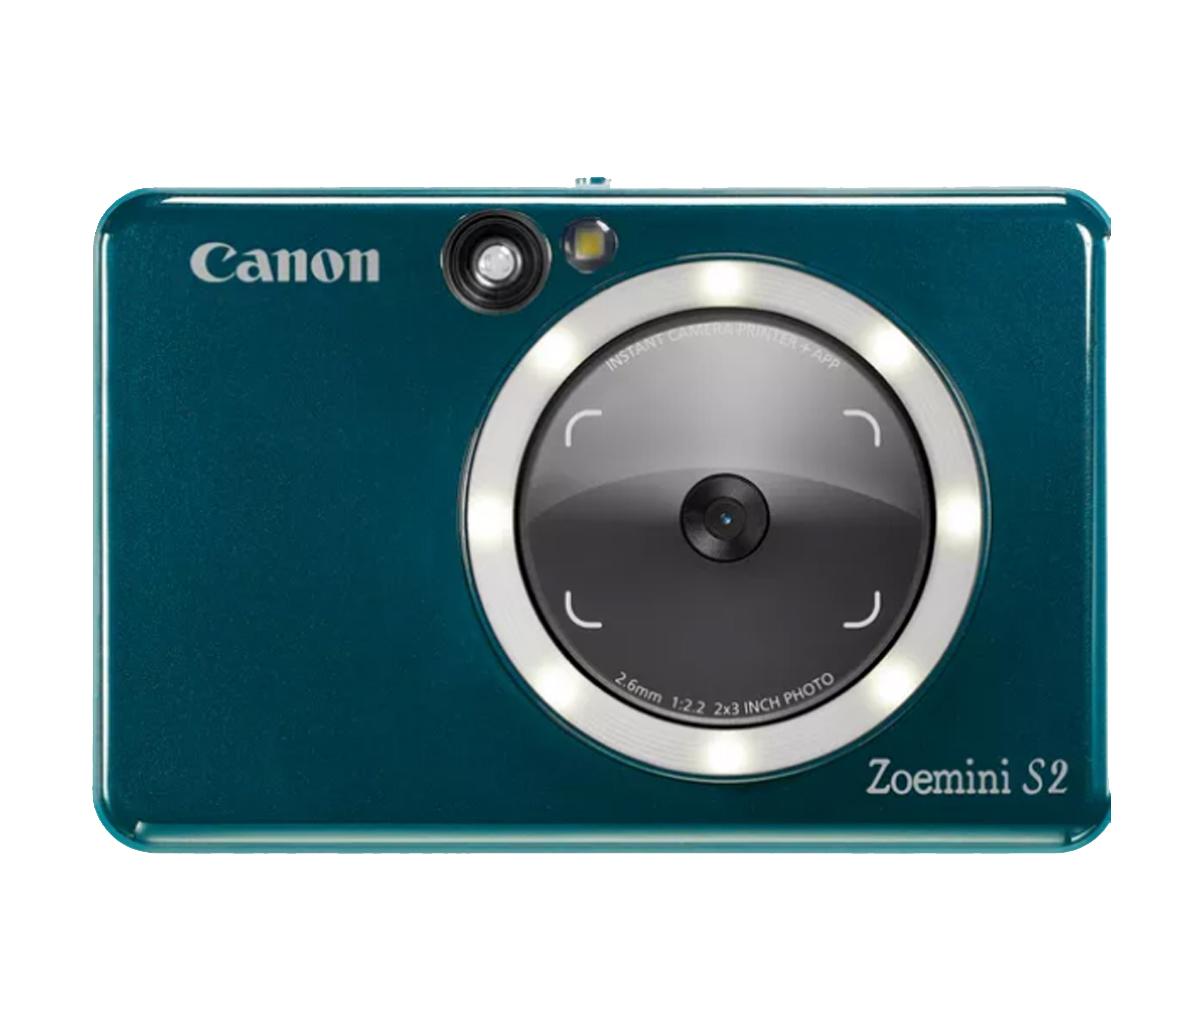 Canon Zoemini S2 Sofortbildkamera Aquamarin